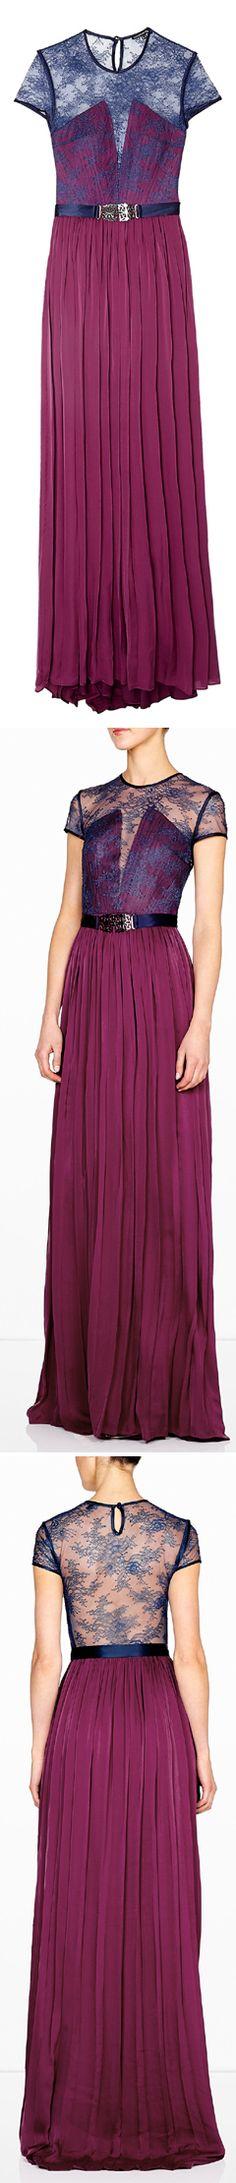 Purple Primrose Satin Georgette Dress